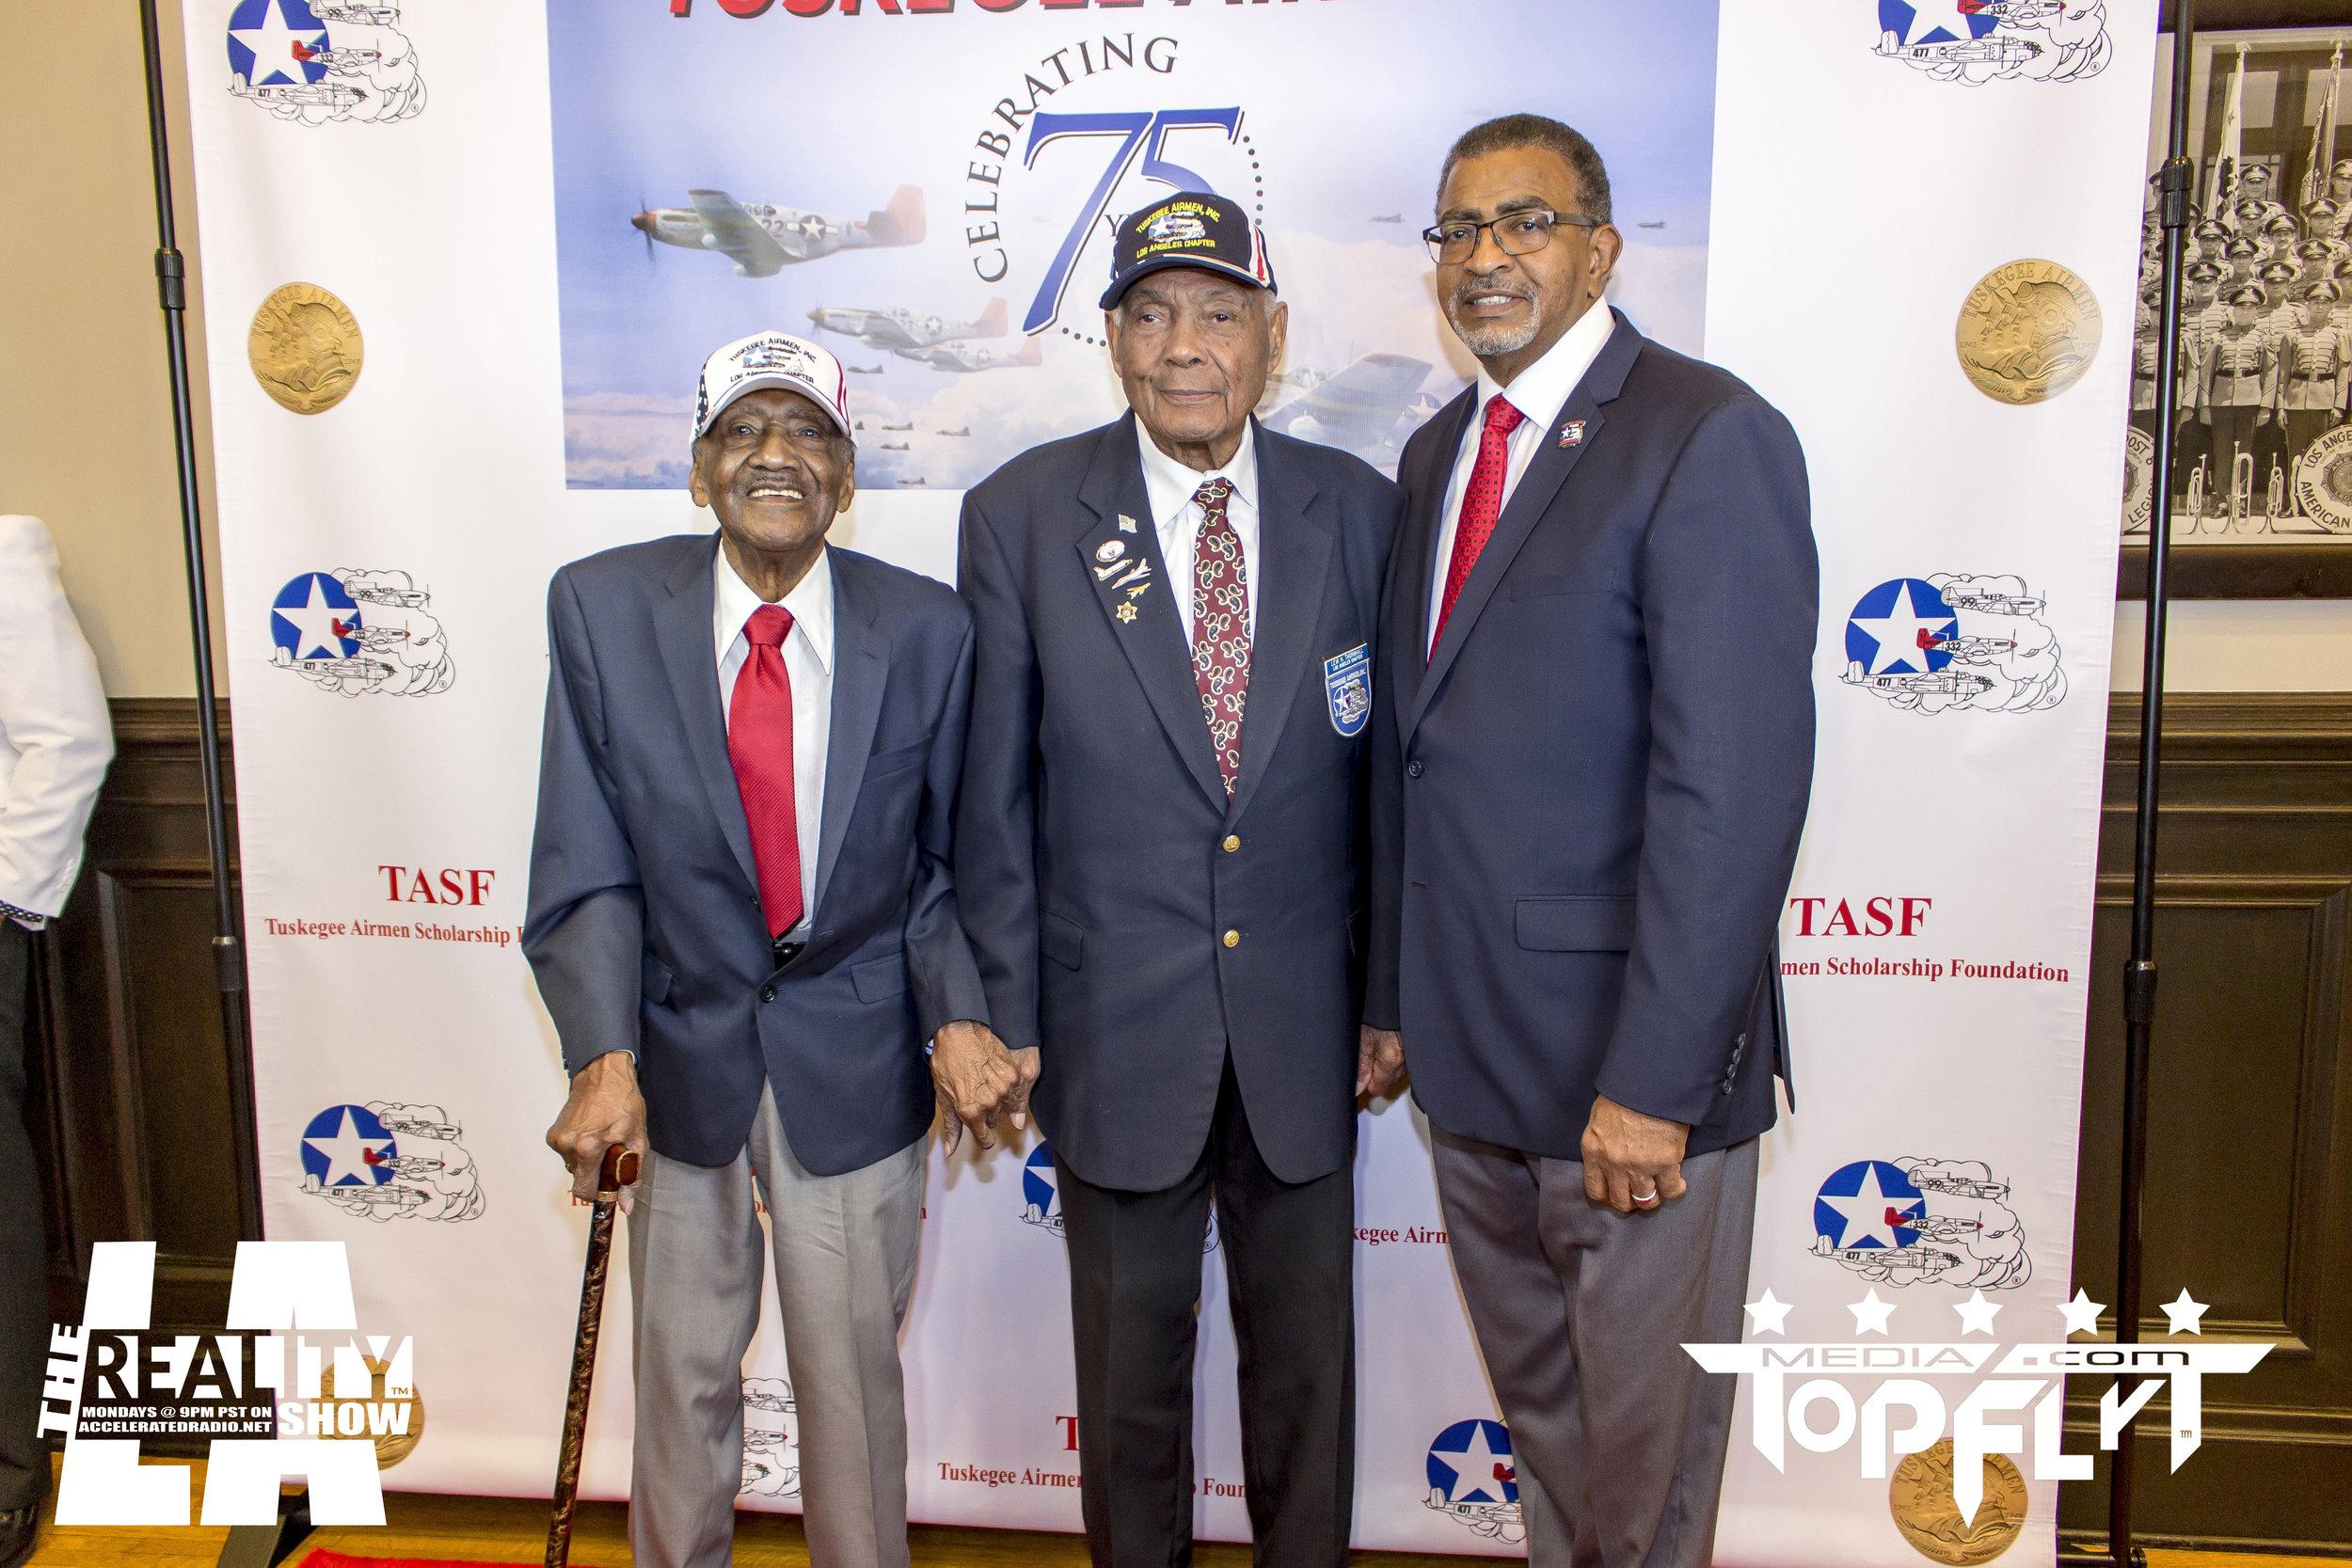 The Reality Show LA - Tuskegee Airmen 75th Anniversary VIP Reception_21.jpg